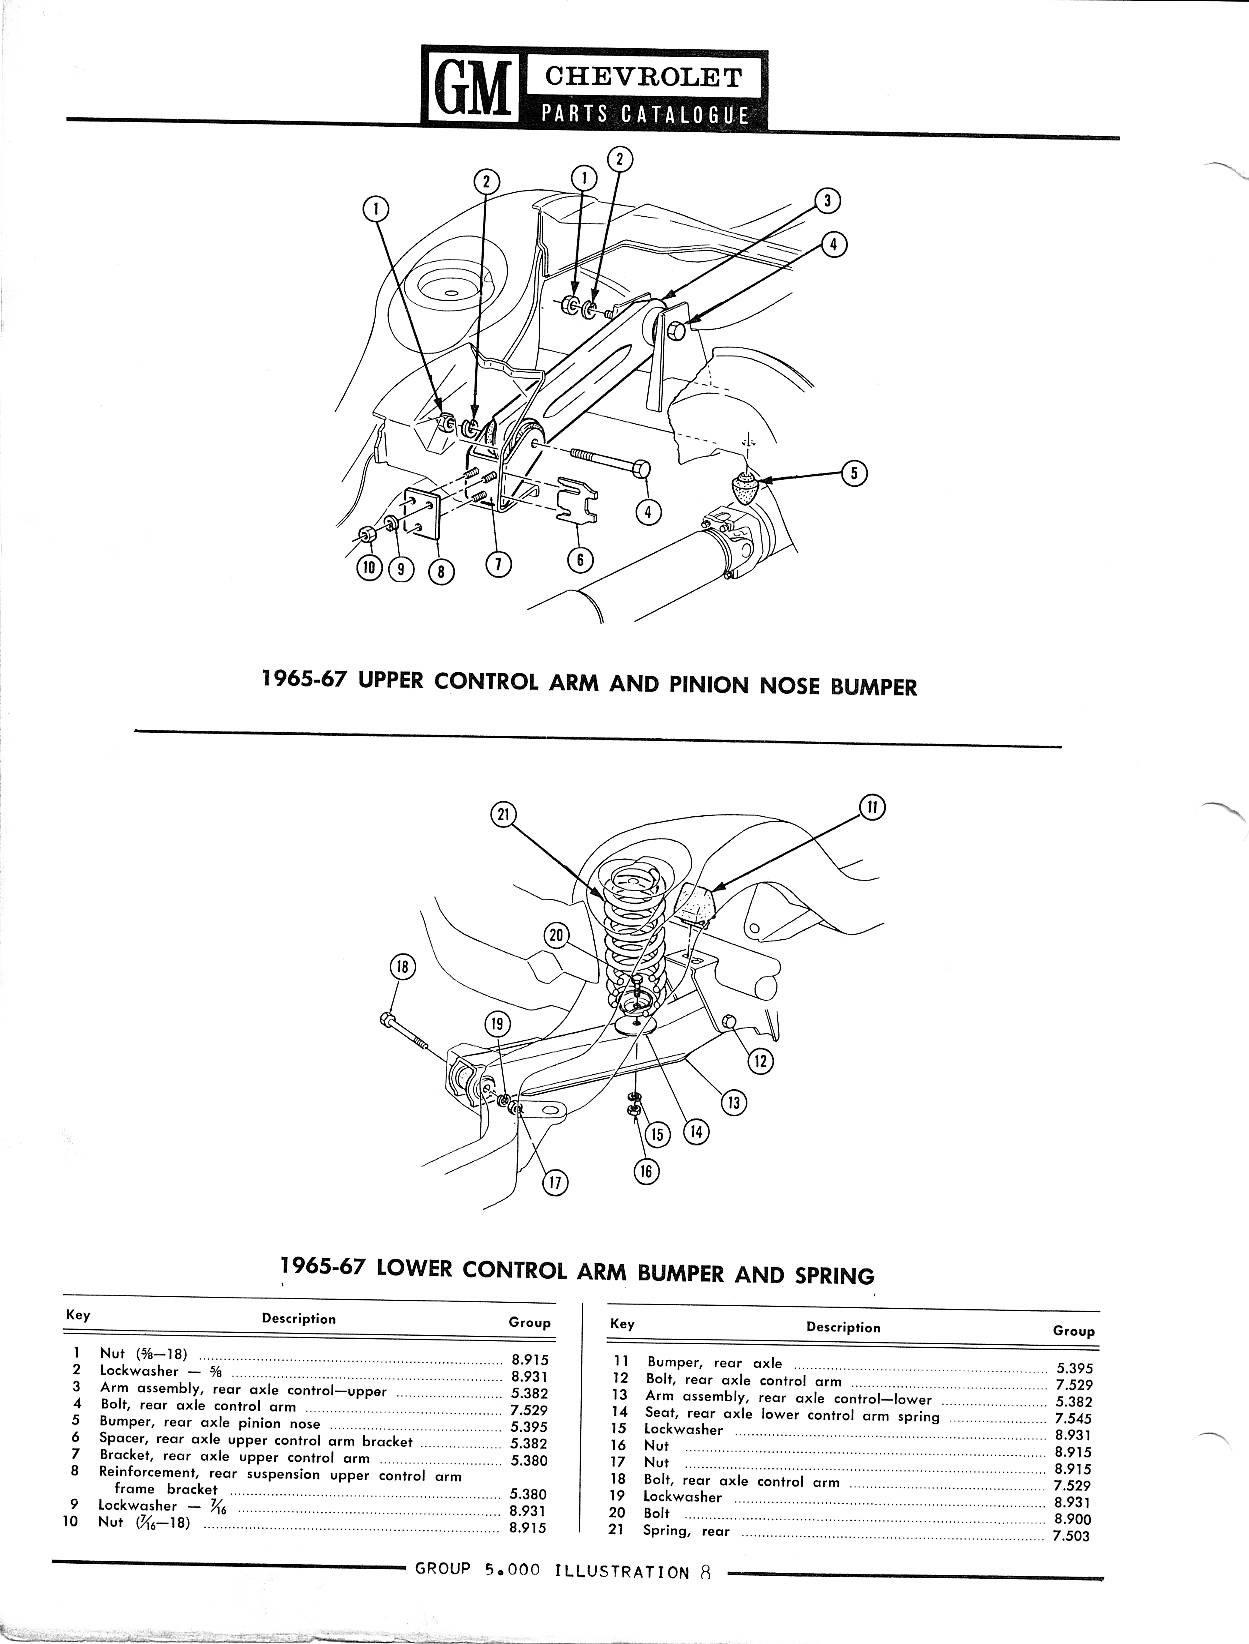 1958-1968 Chevrolet Parts Catalog / Image25.jpg